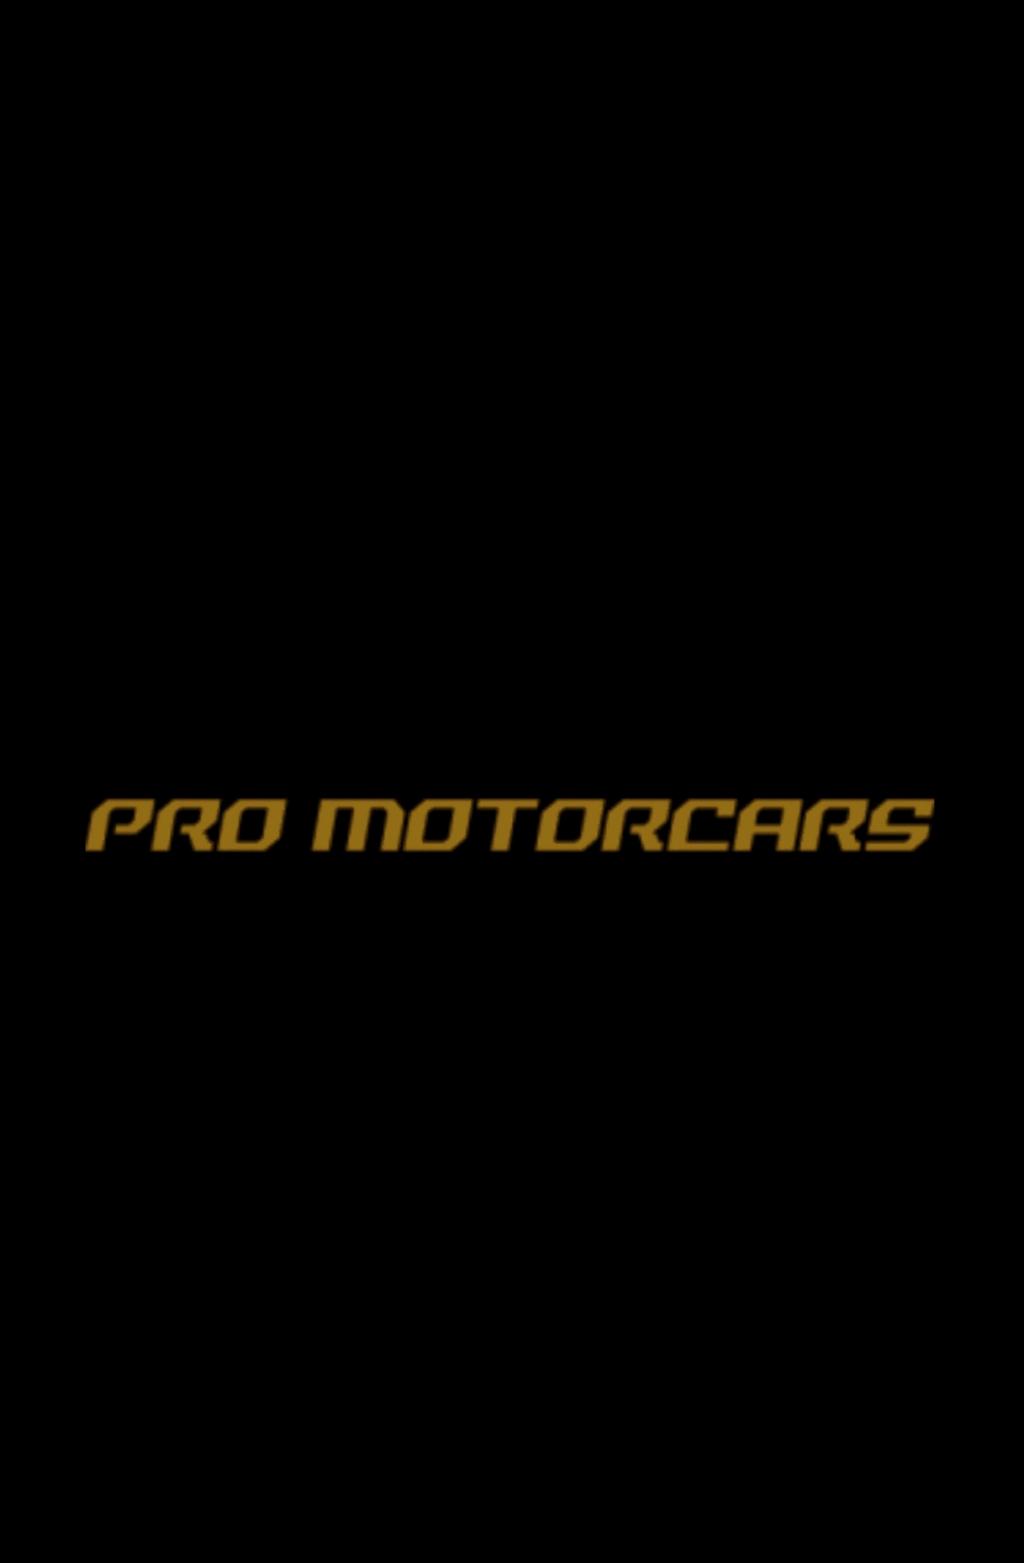 Pro Motorcars - car dealer    Photo 7 of 7   Address: 725 S Beach Blvd, Anaheim, CA 92804, USA   Phone: (949) 668-5454